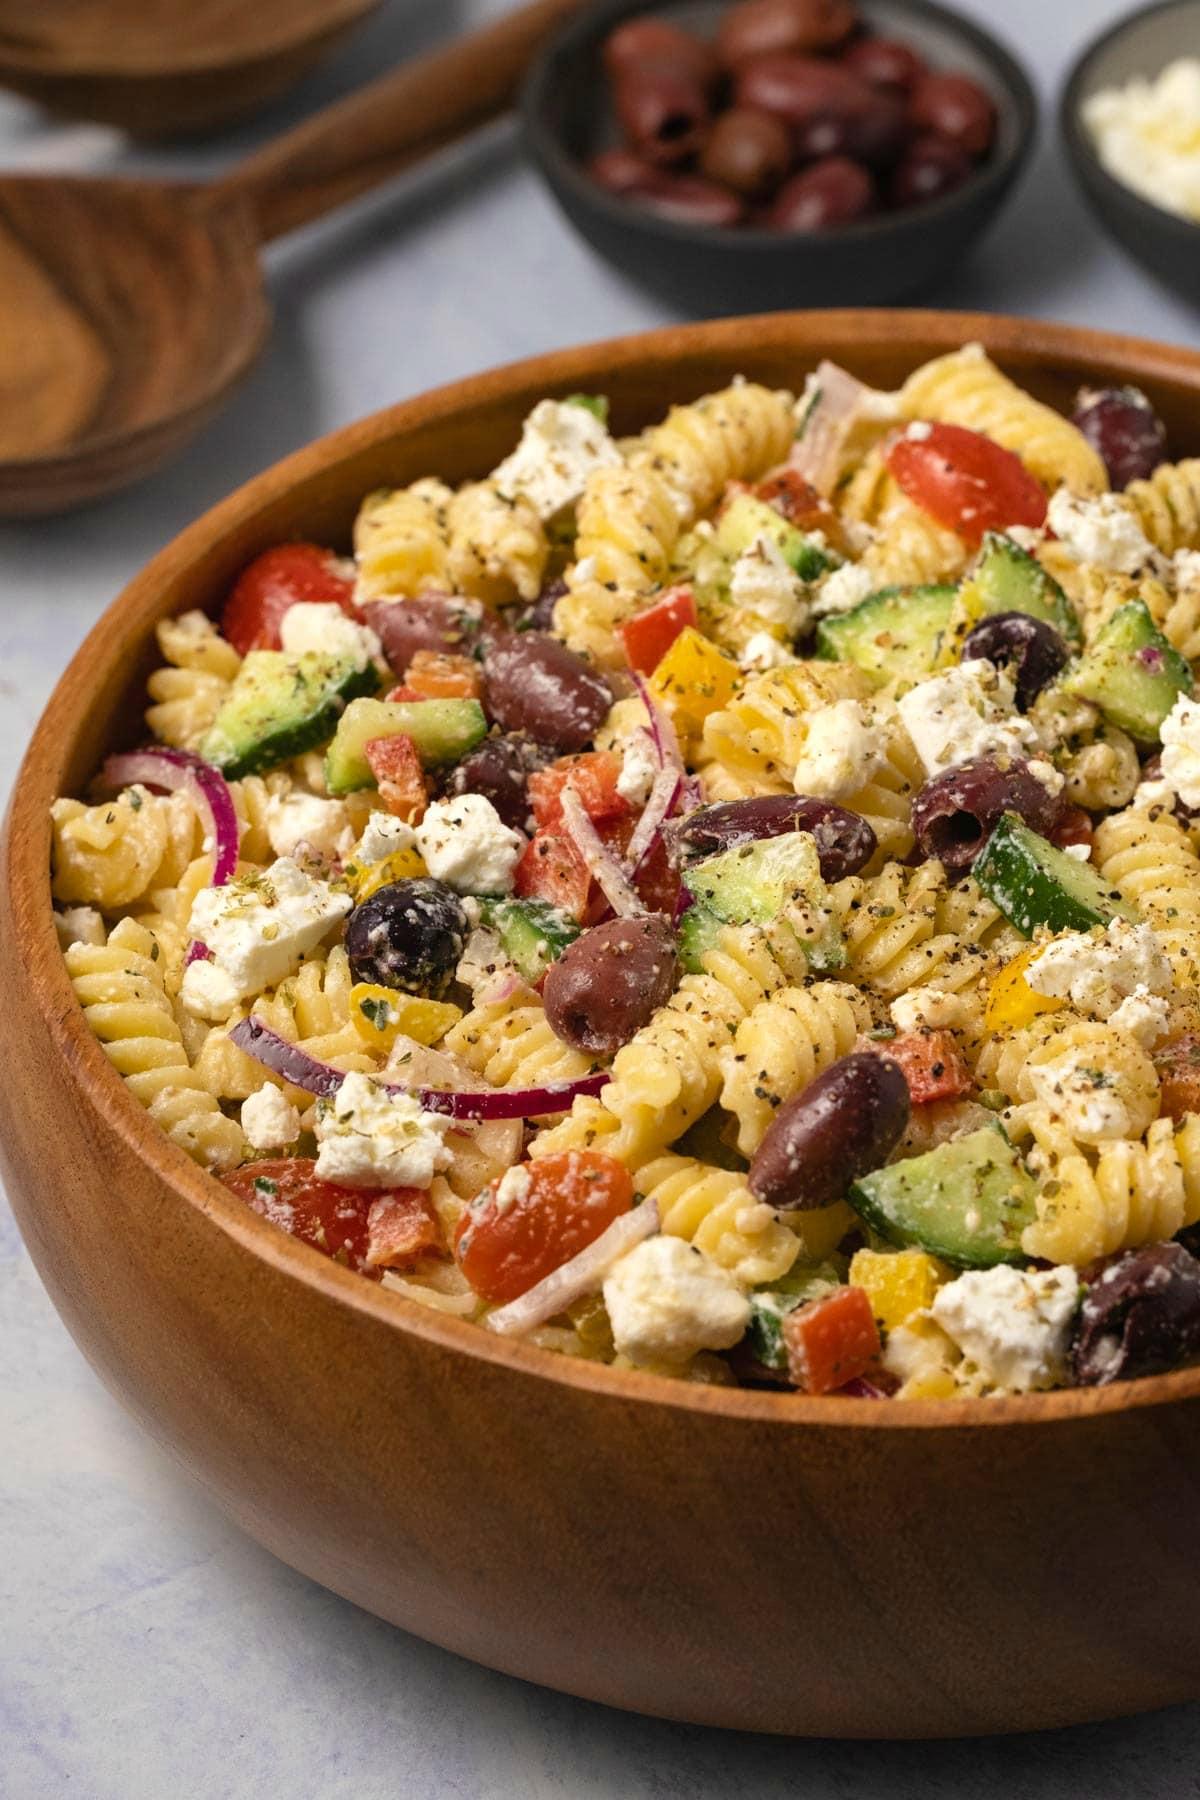 Greek pasta salad in a wooden salad bowl.